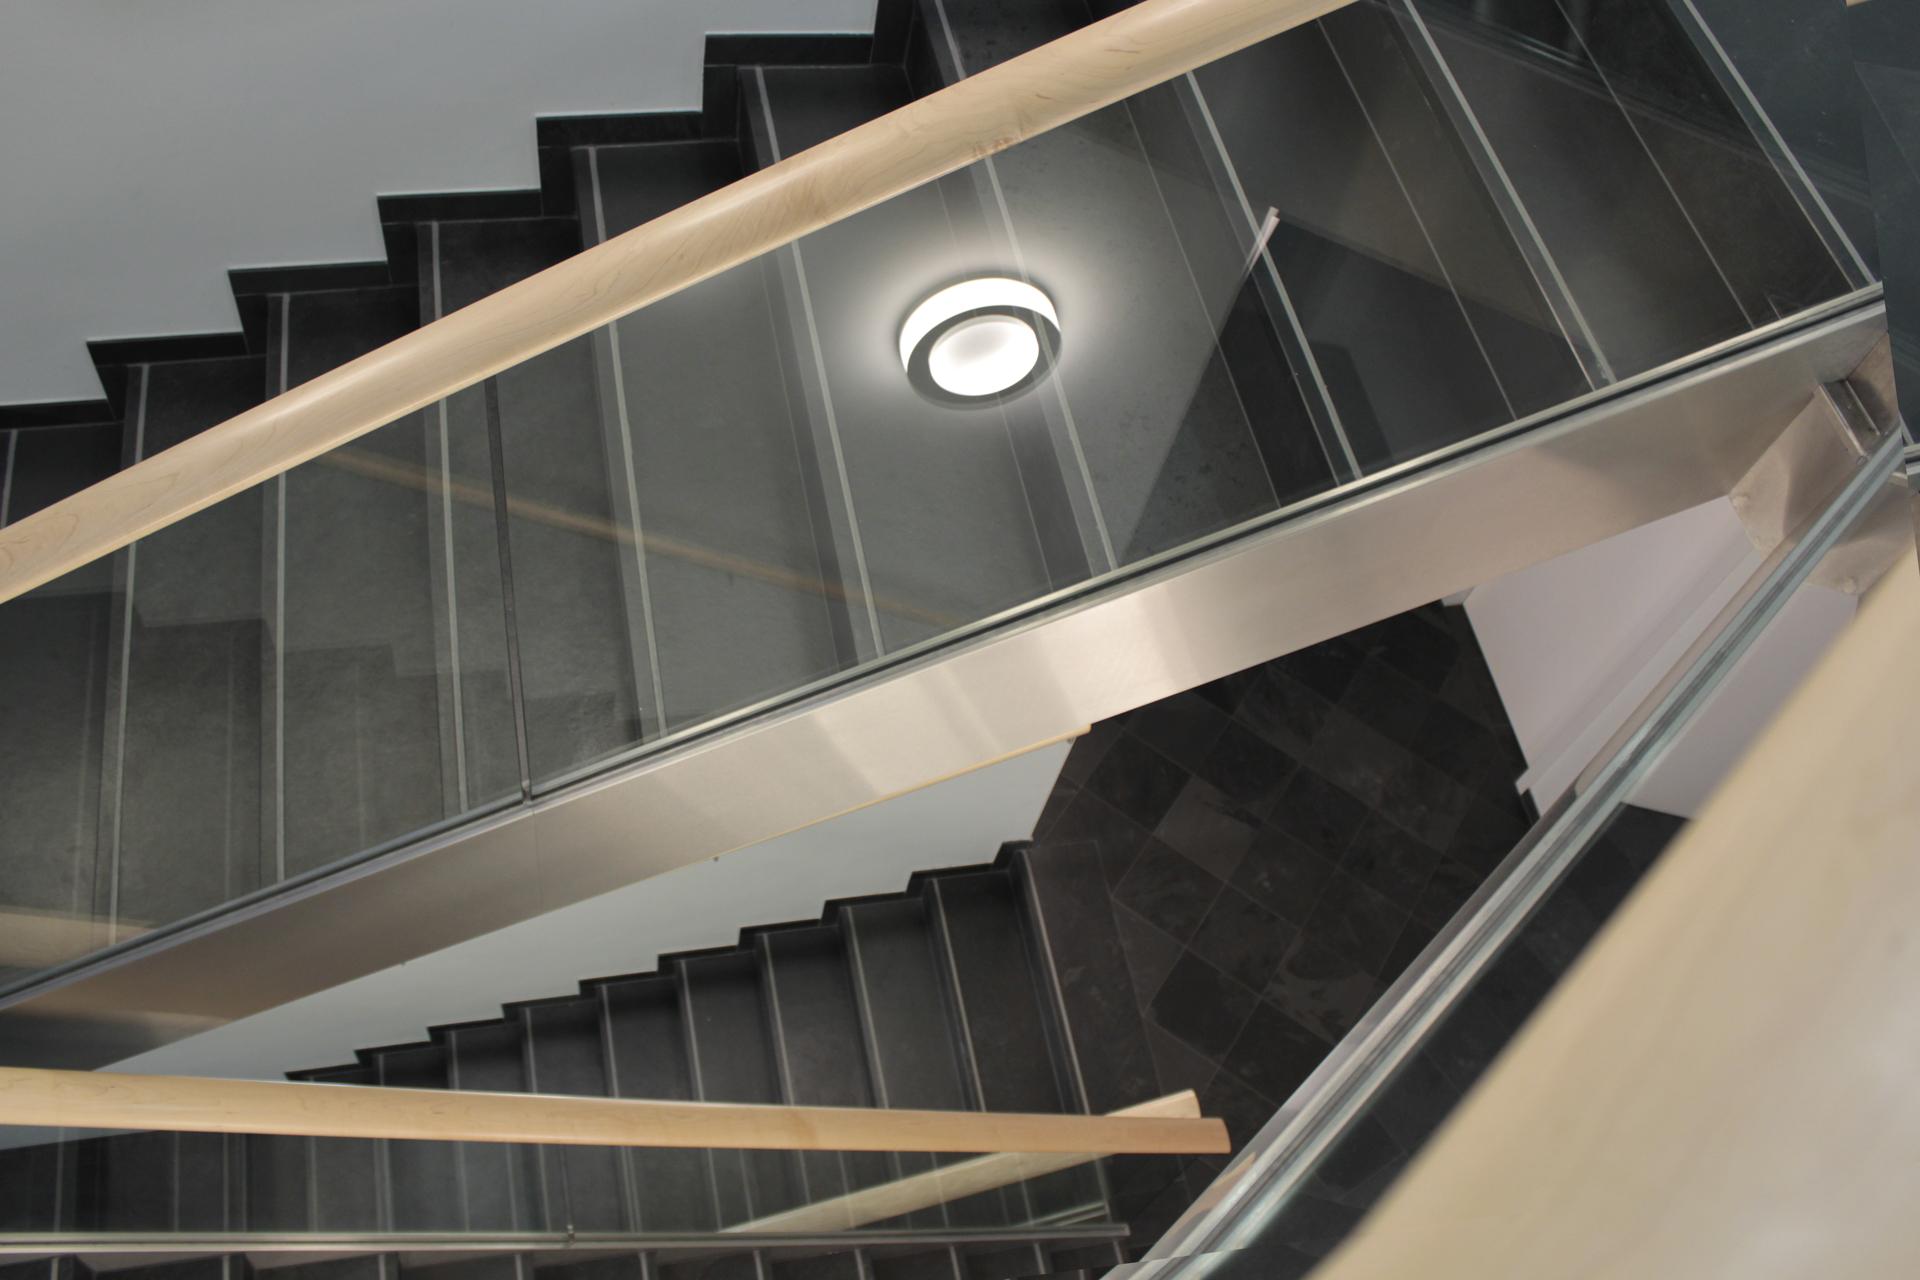 tischlerei-decker-eurotours-treppenaufgang